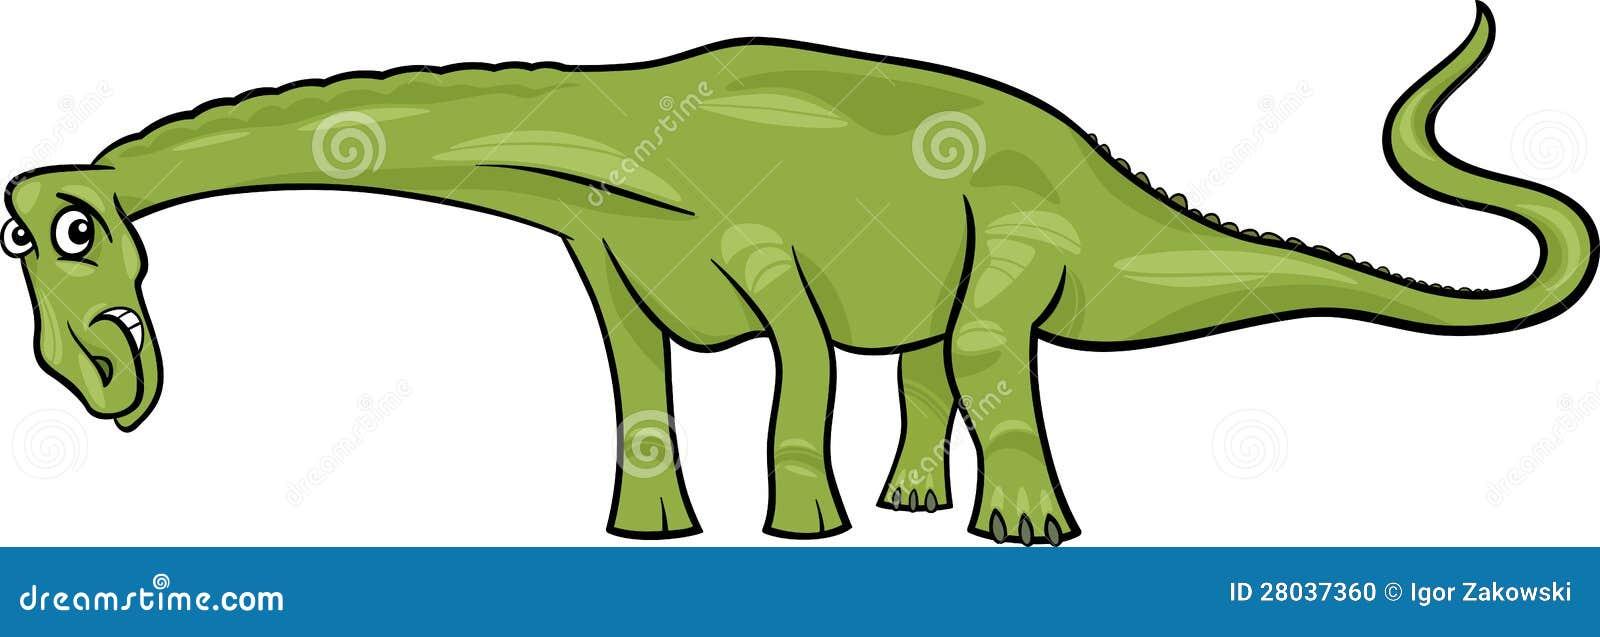 cartoon illustration of diplodocus dinosaur